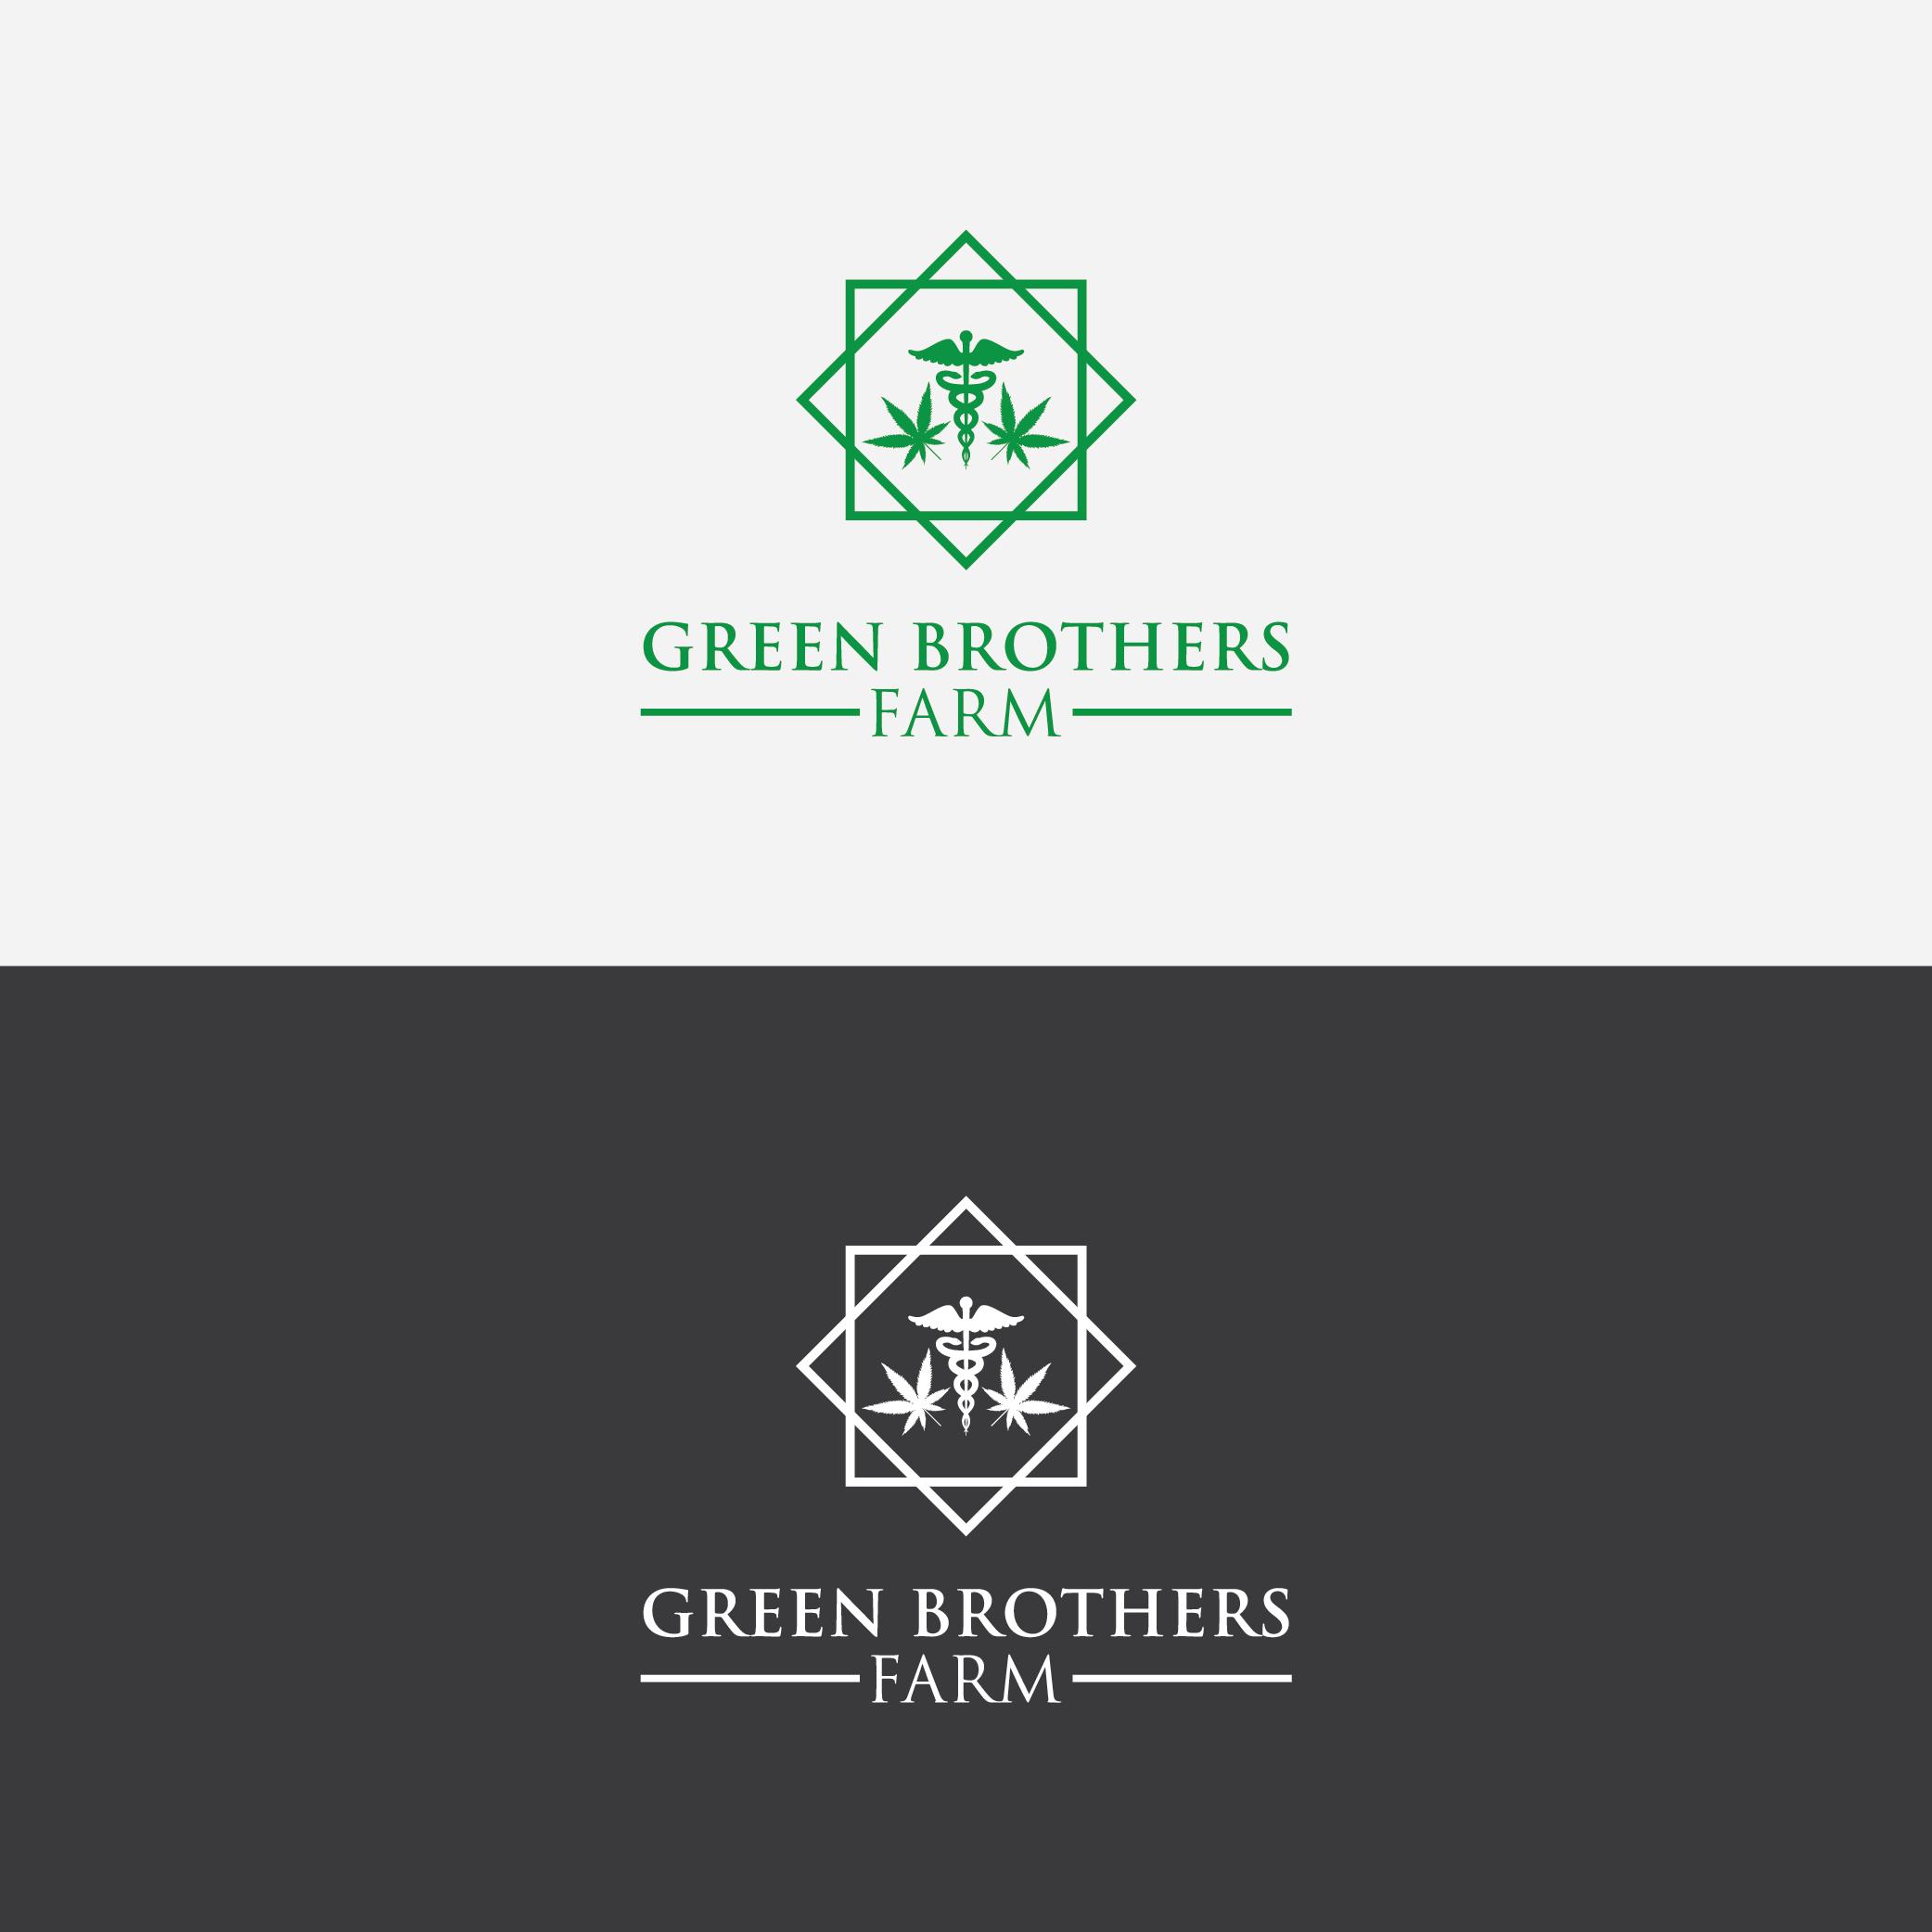 Logo Design by 354studio - Entry No. 58 in the Logo Design Contest Green Brothers Farm Logo Design.